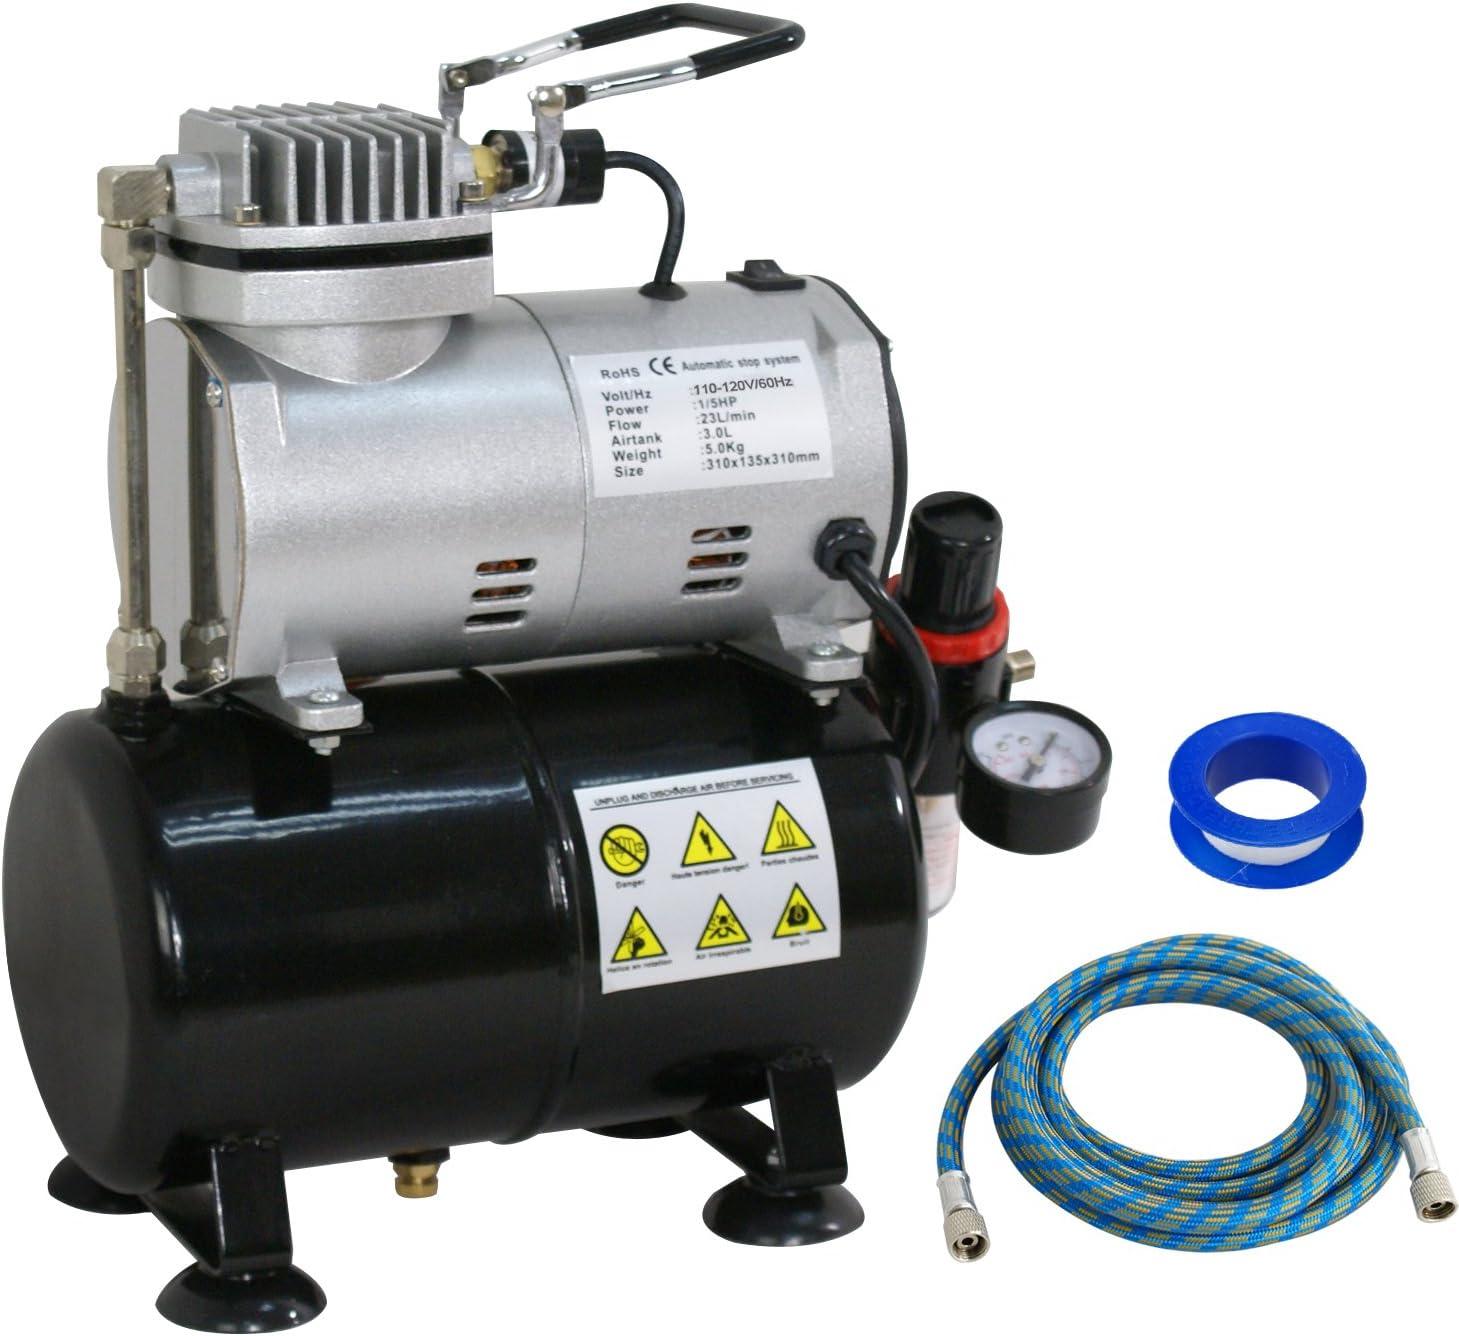 ZENY Airbrush Air Tank Compressor Regulator Filter Hose 3L Tank TC-20T